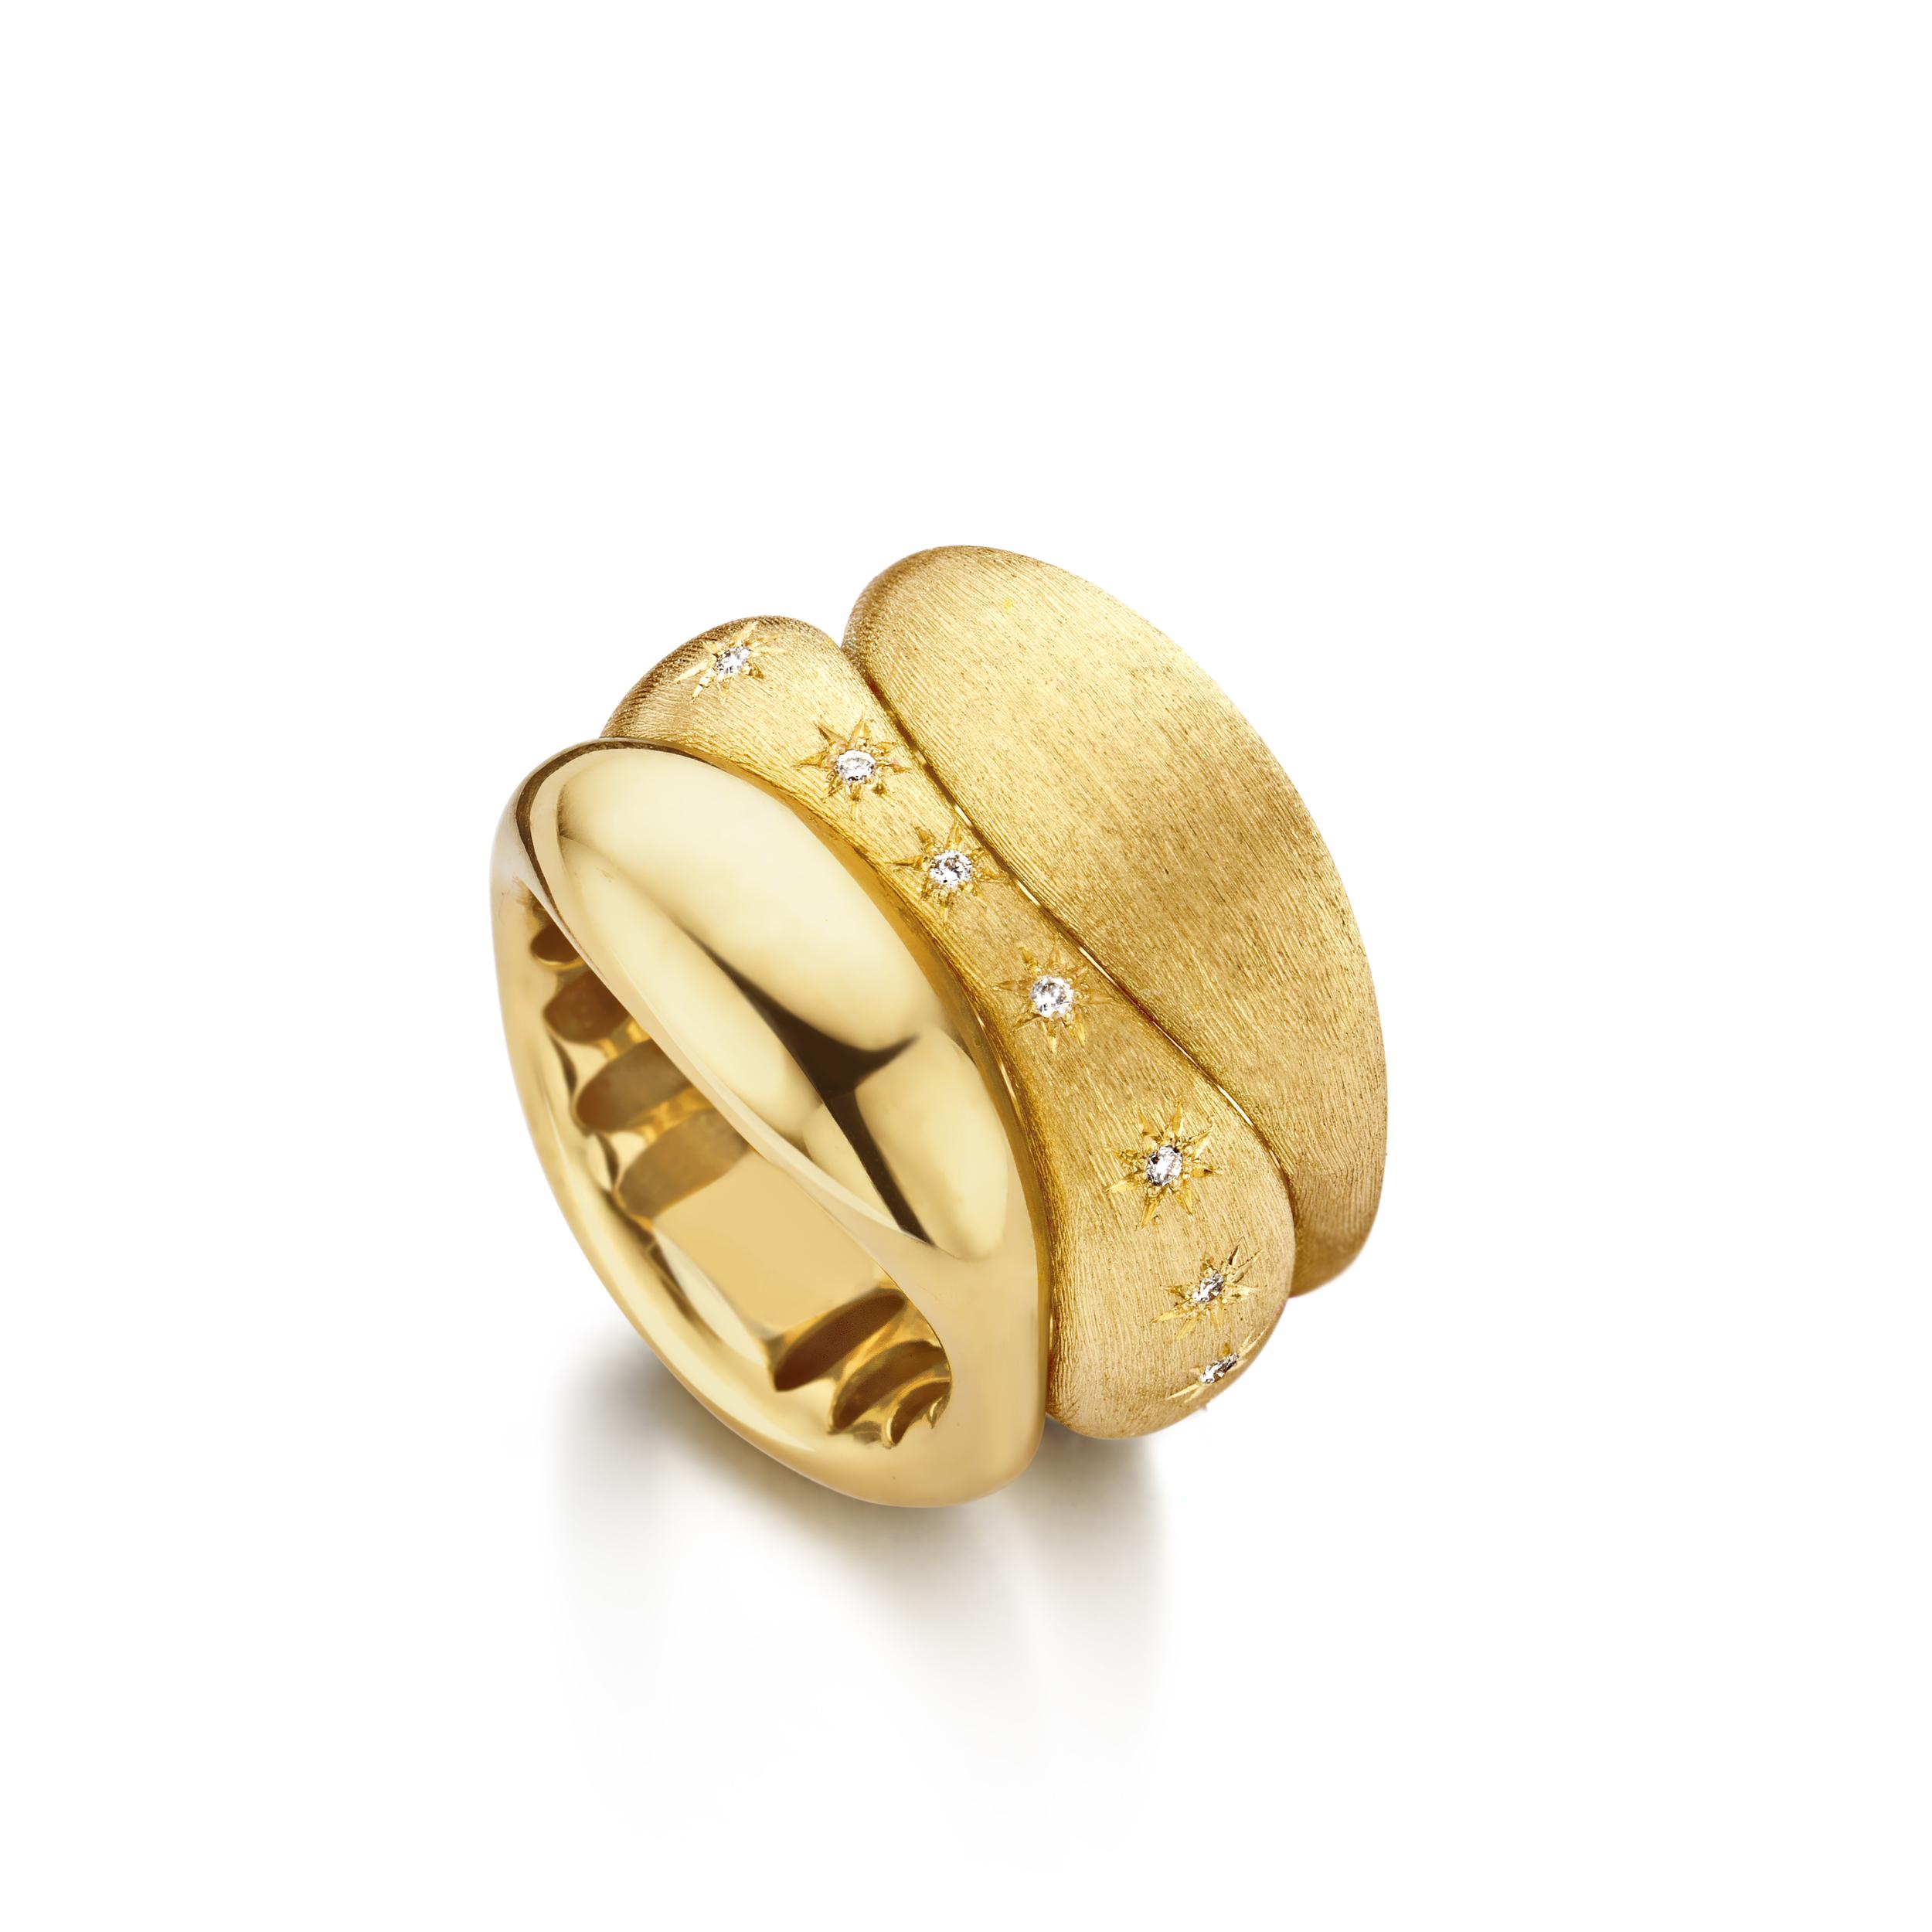 Nanis Ring | Jewelers Camarillo | Van Gundys